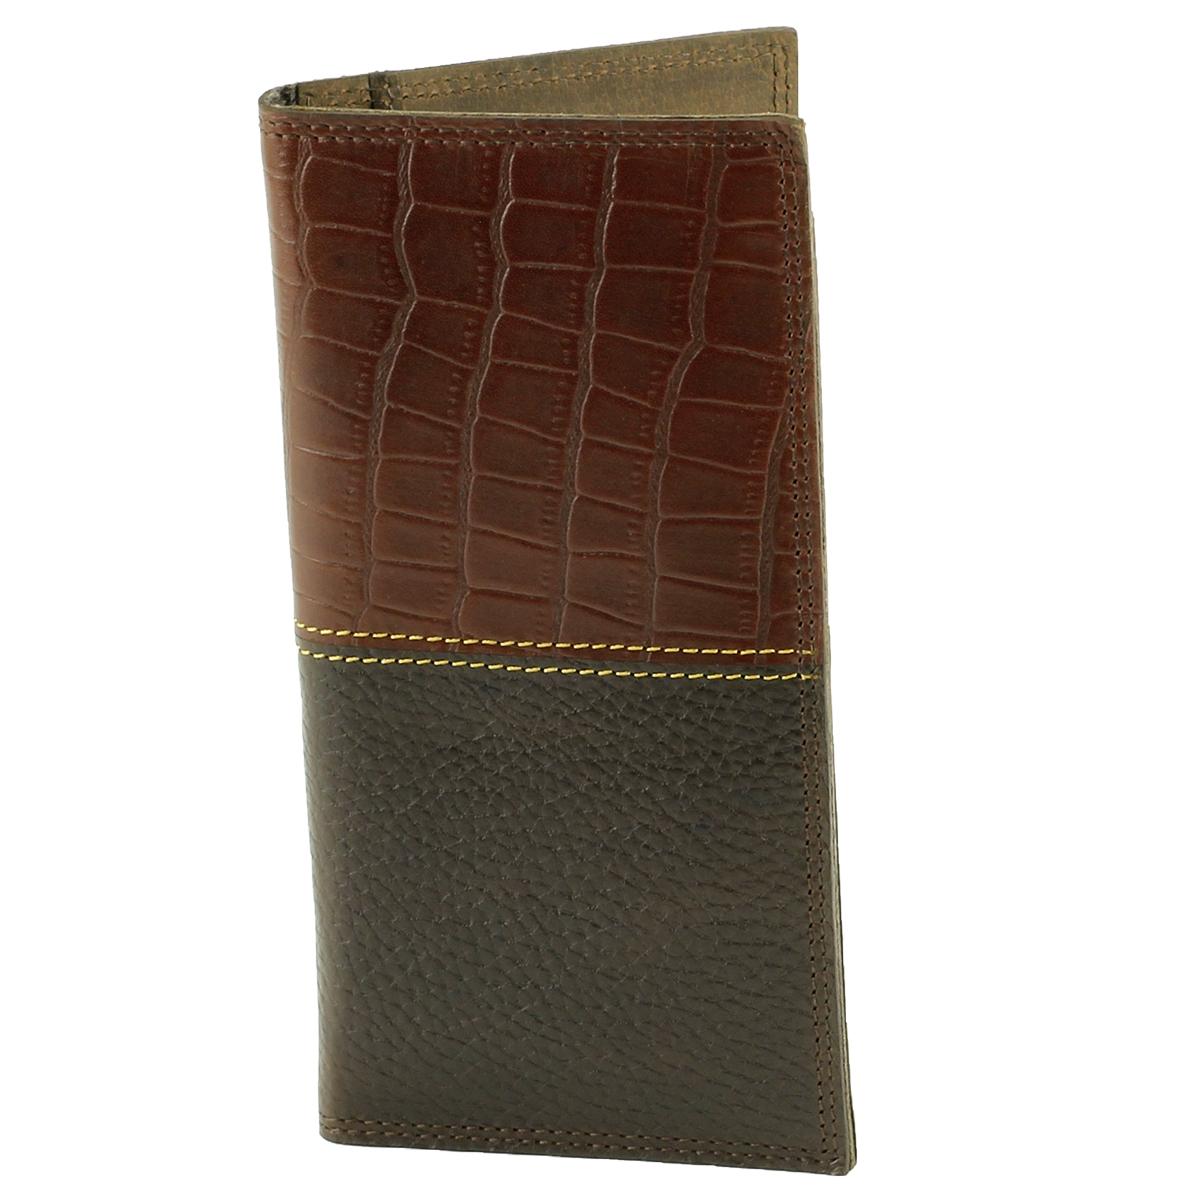 Tall Rodeo Wallet Croc Print Brown